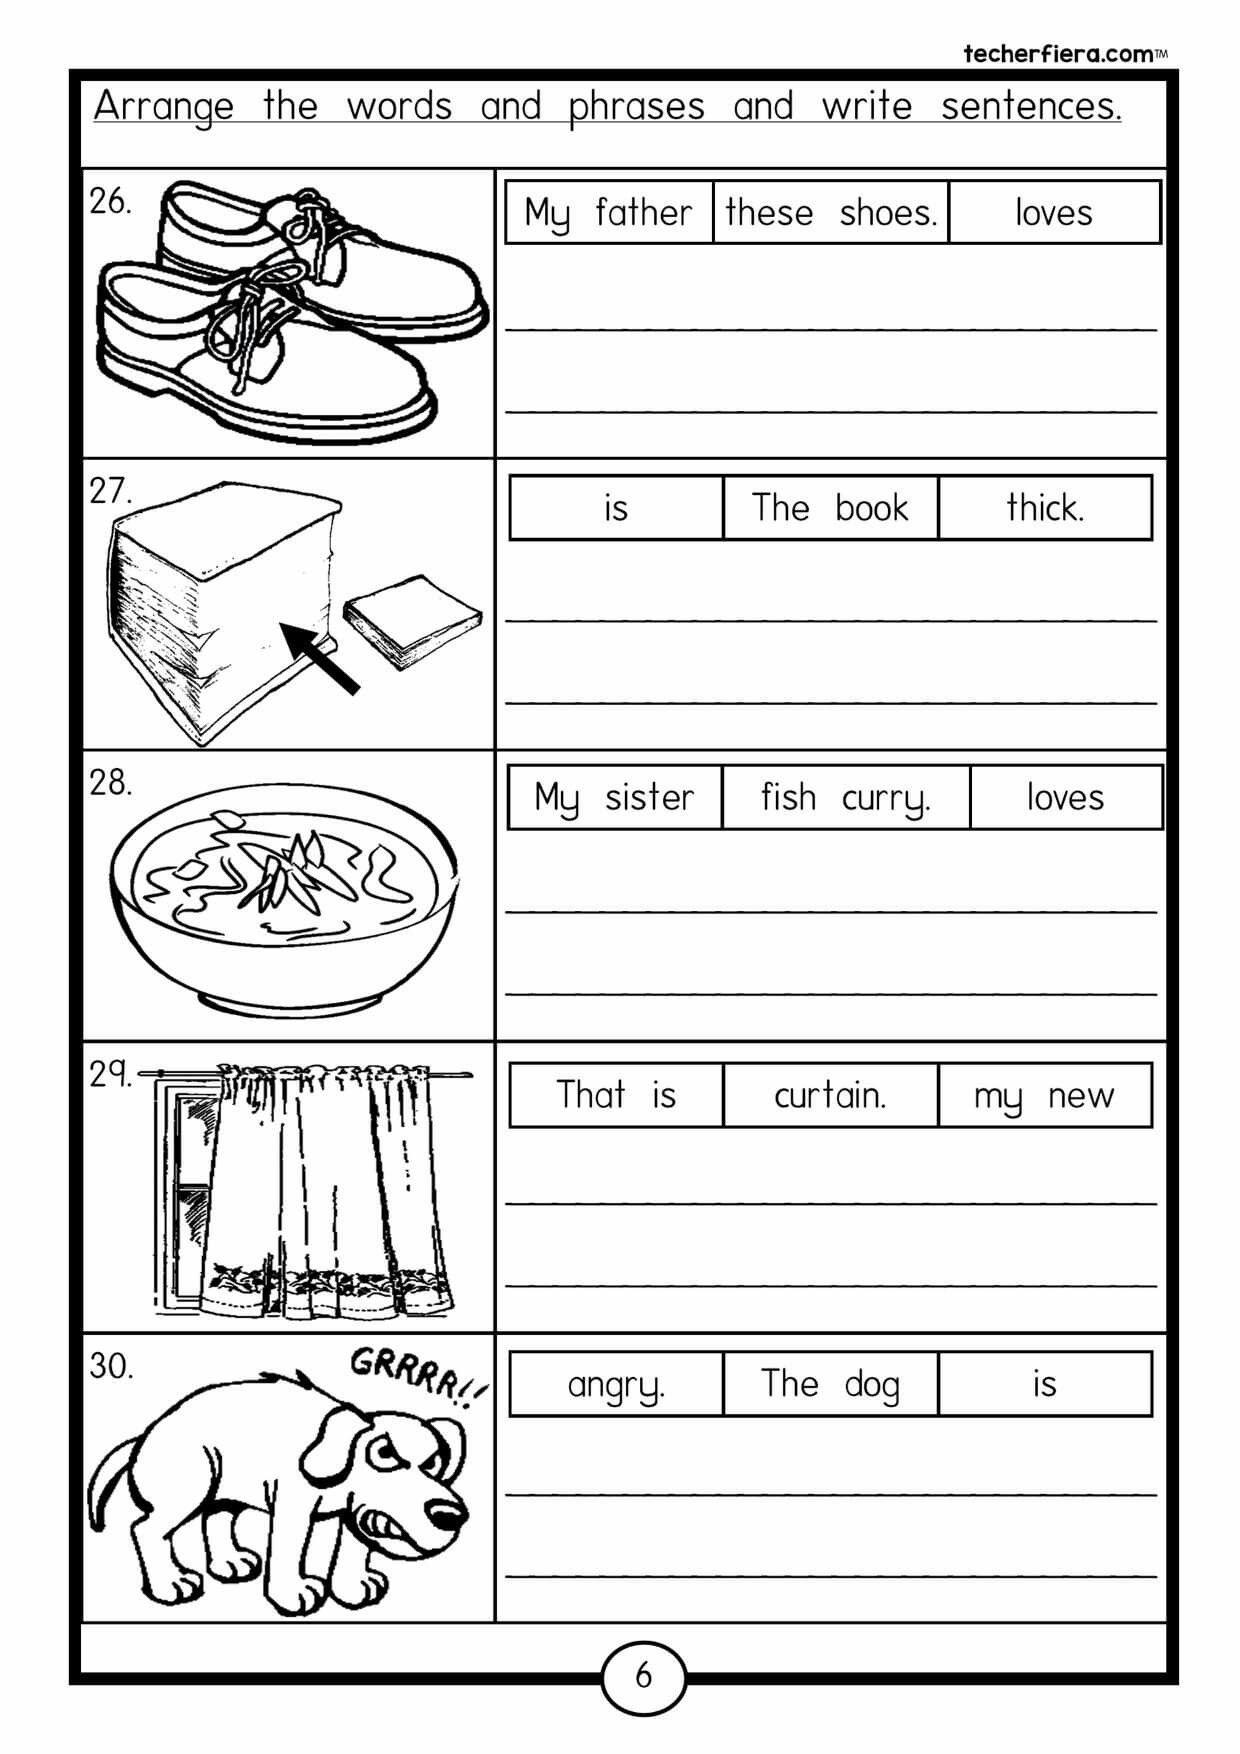 English Grammar Worksheet Free Kindergarten English Worksheet For Kids English Worksheets For Kids Grammar Worksheets Kindergarten Grammar Worksheets [ 1035 x 800 Pixel ]